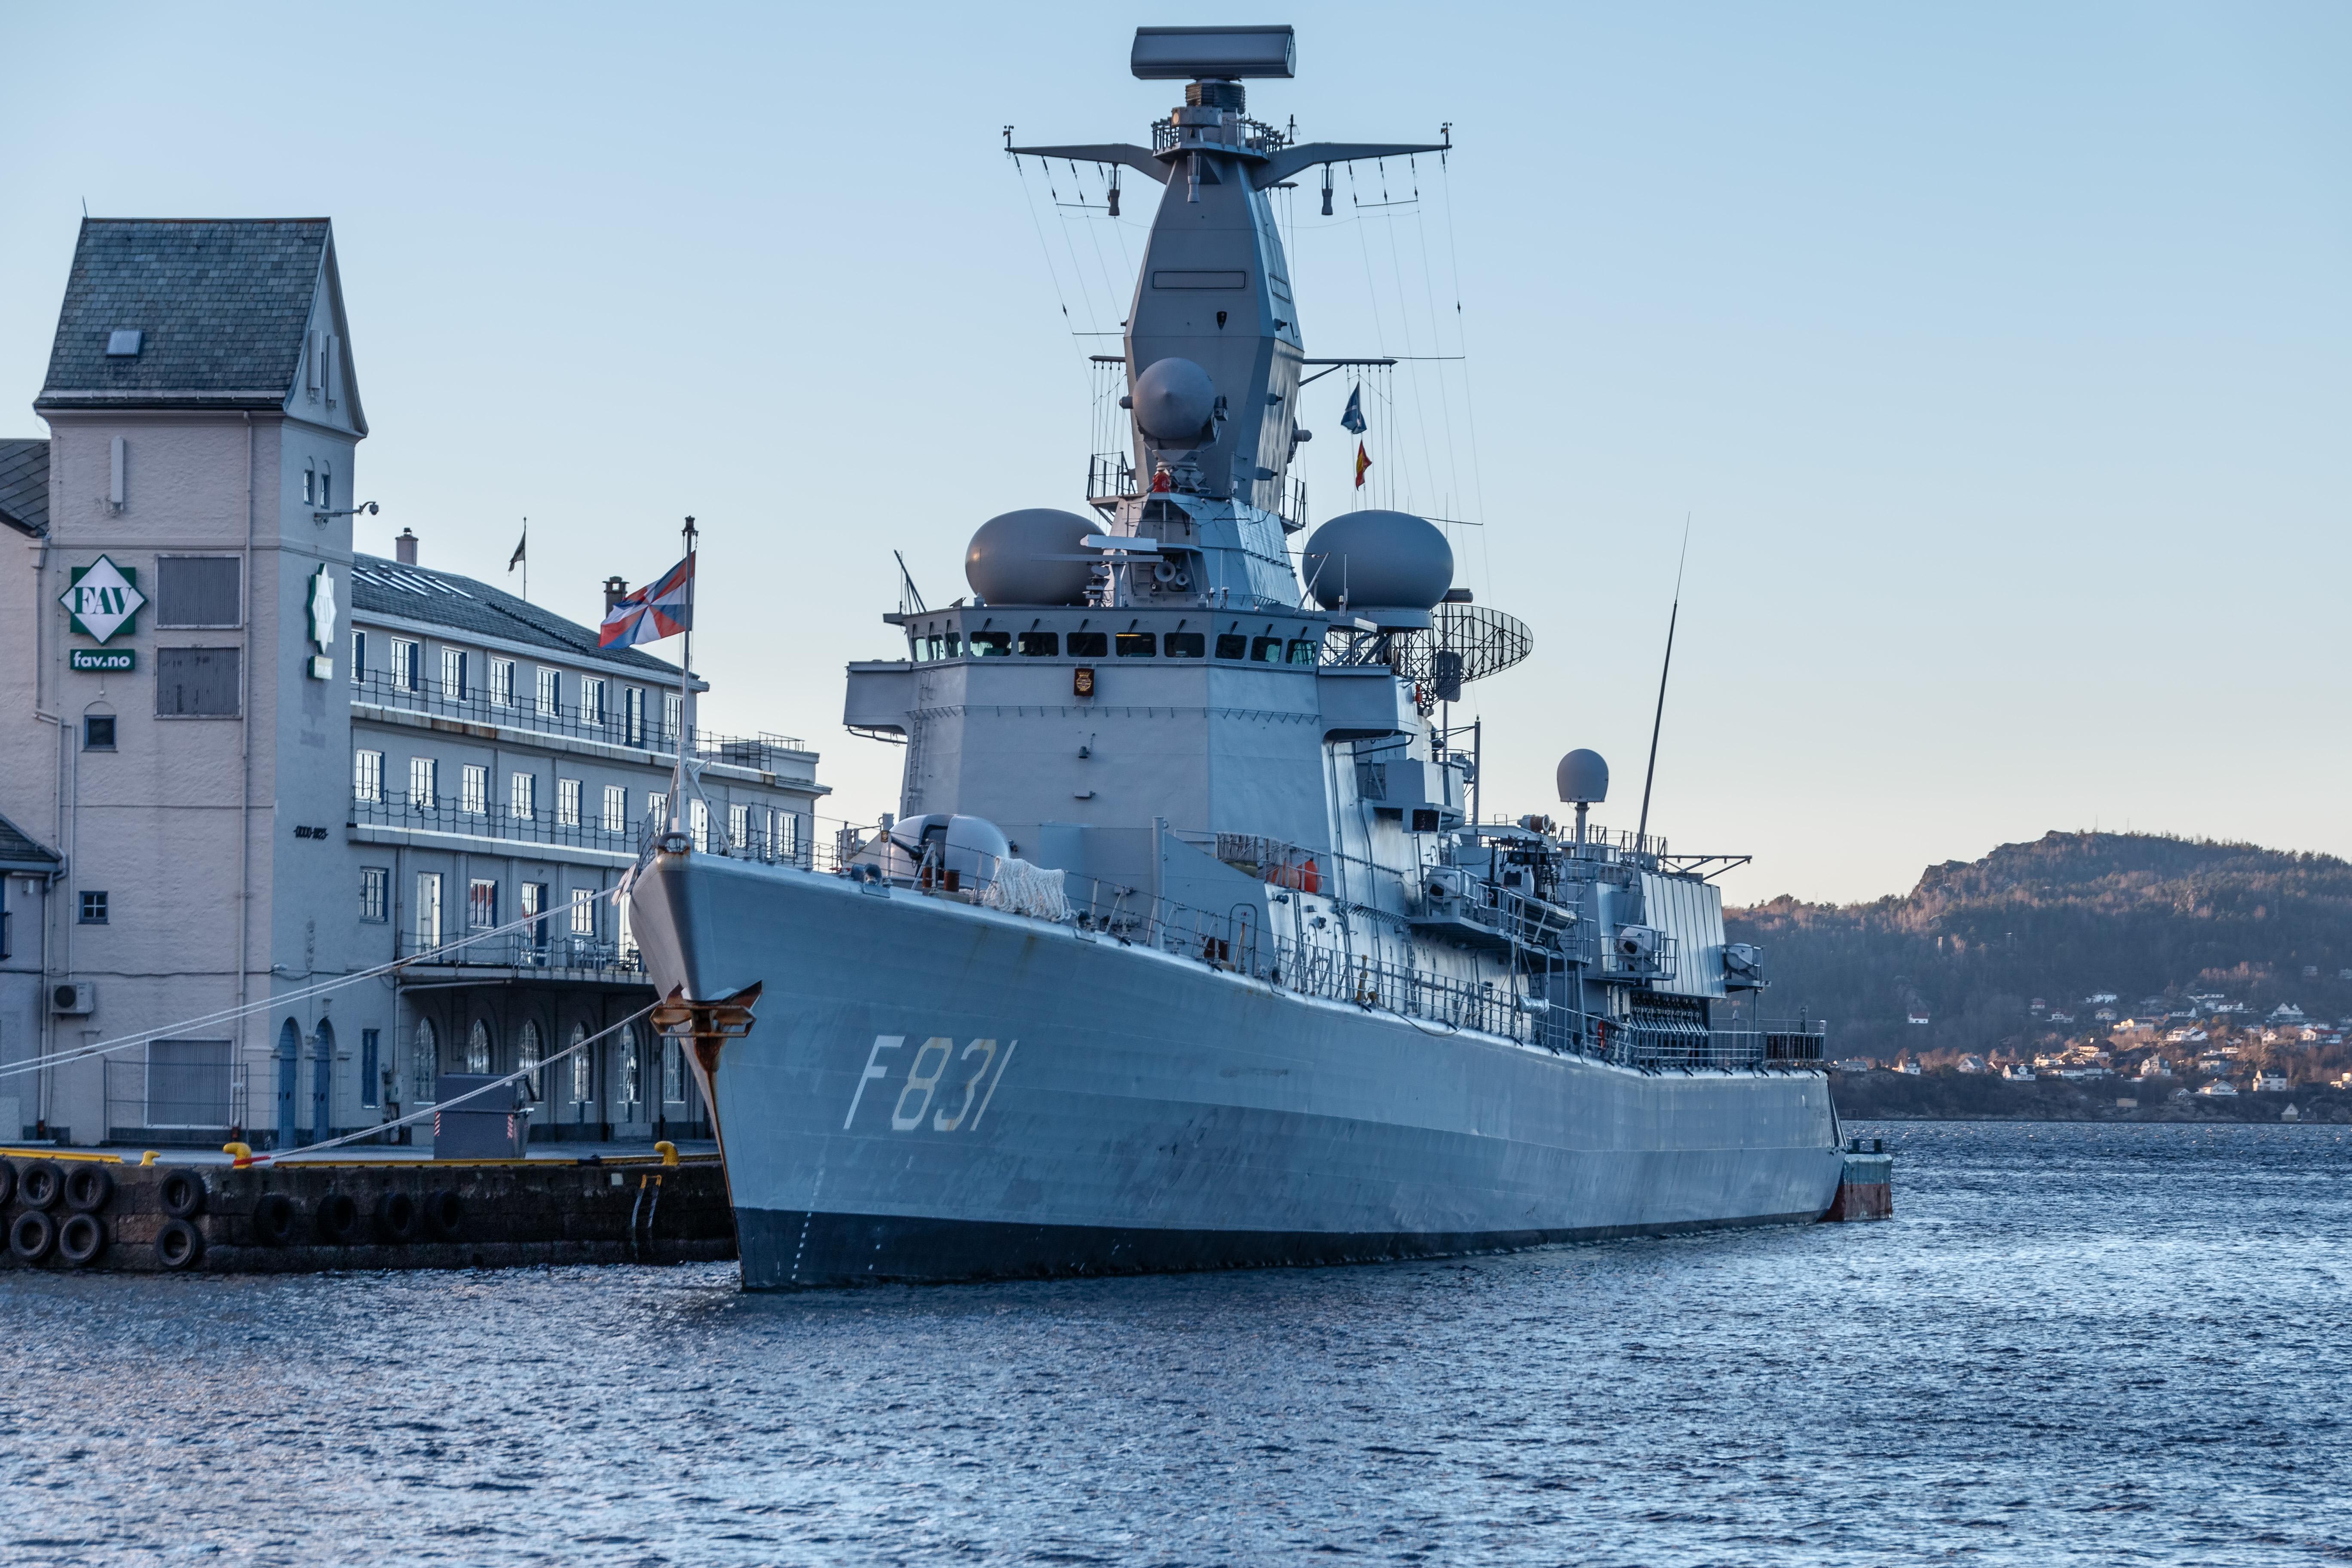 M-klasse fregatten (Karel Doorman M-class frigates) - Page 3 24597081899_3026d6c7aa_o